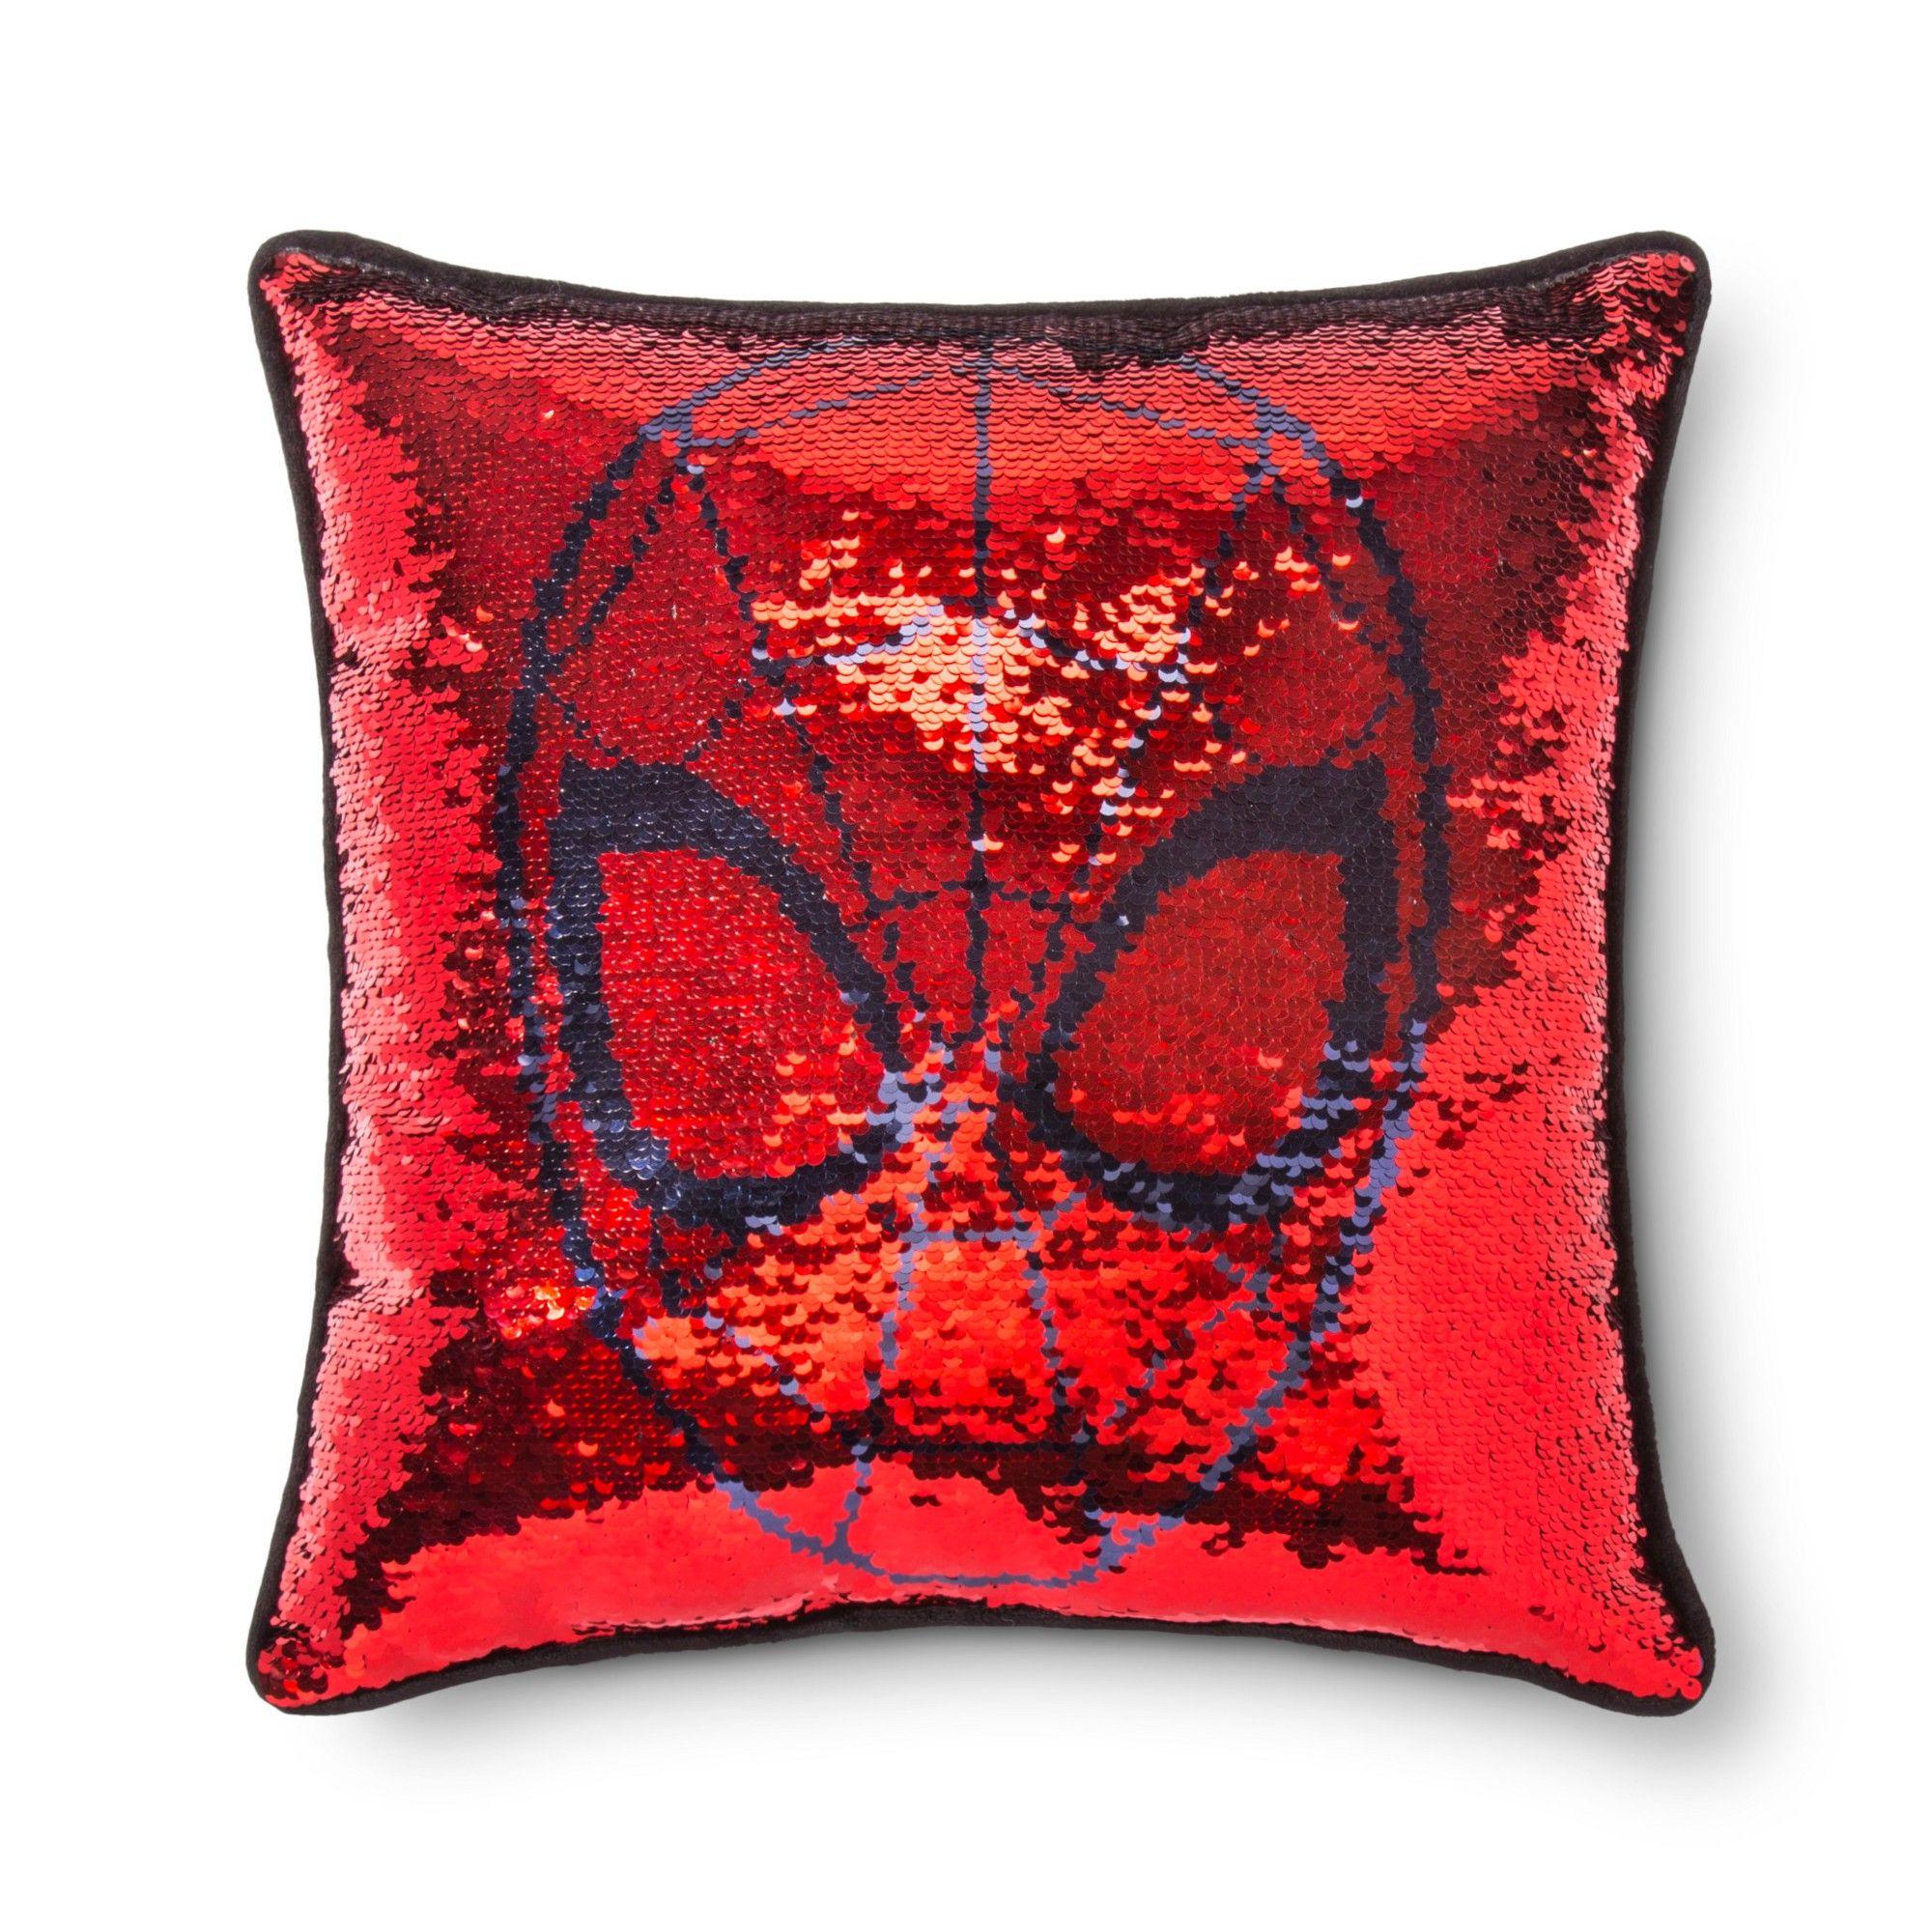 Brand New Marvel Spider-Man Symbol Woven Throw Blanket